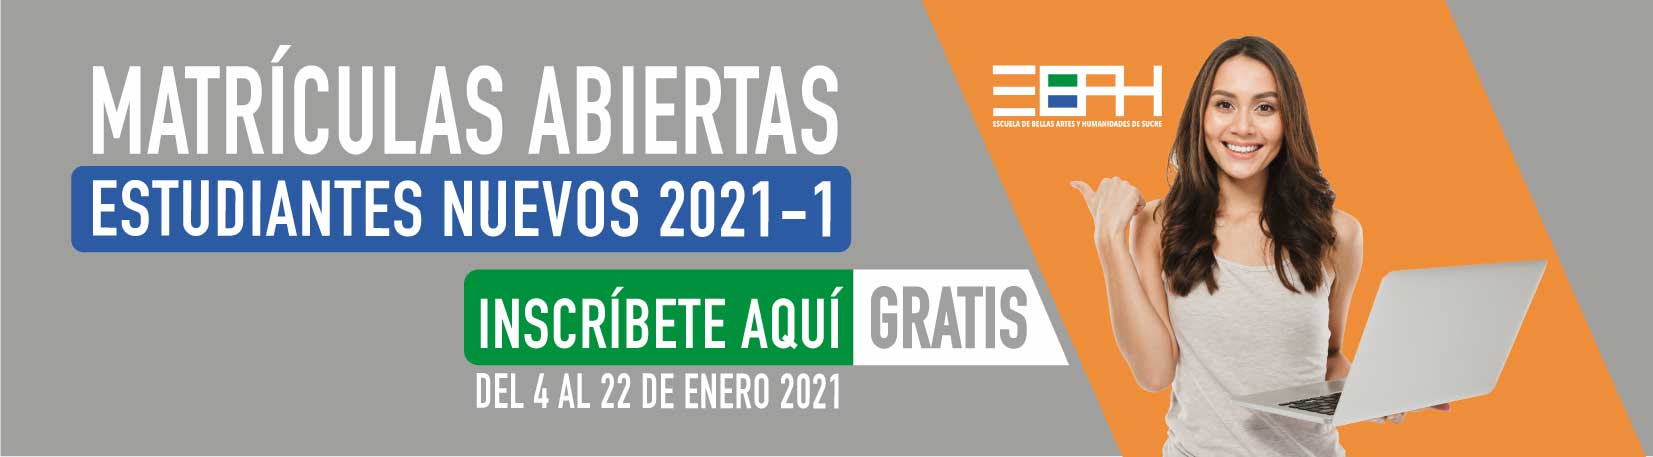 PAG-WEB-PROMO-SEMESTRE-2021-1